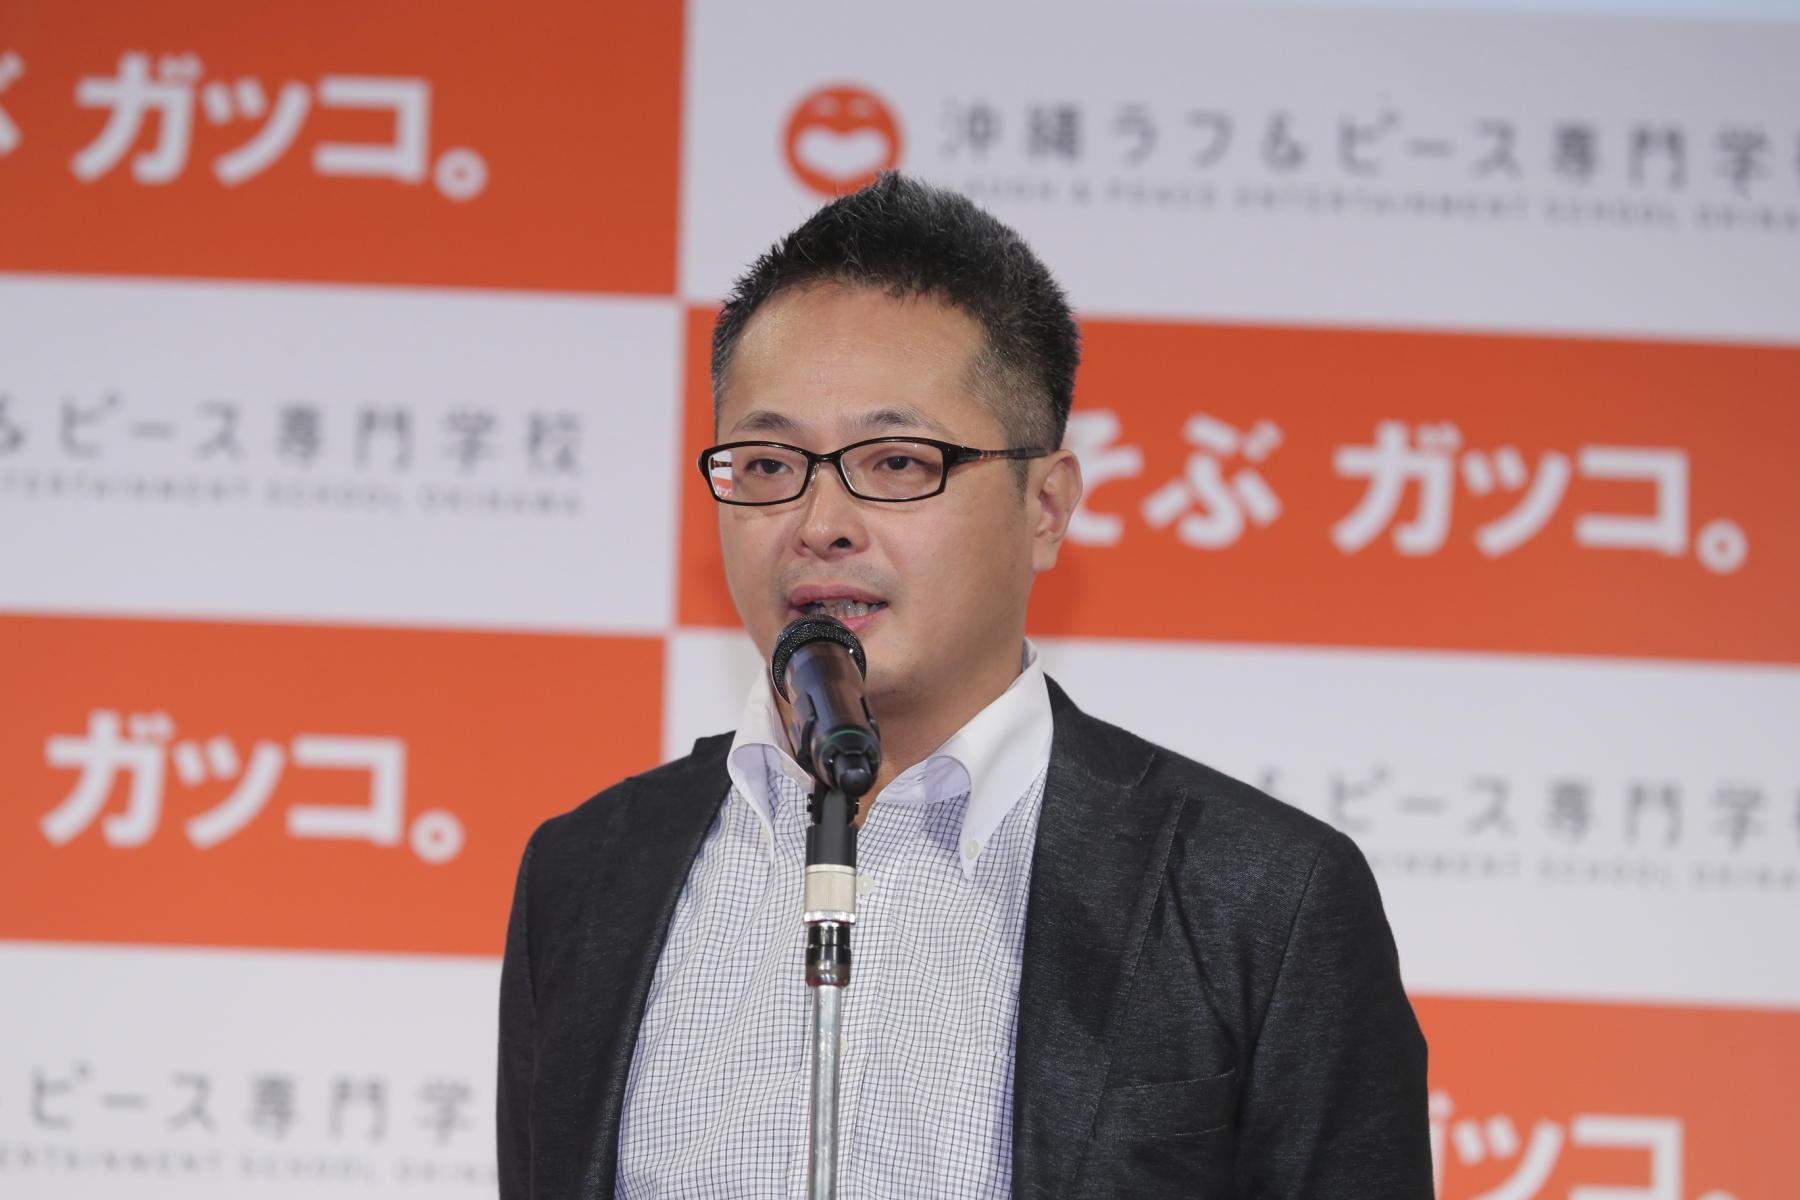 http://news.yoshimoto.co.jp/20171006102850-bcd5ca70e4fb05a86cd3c26d5893eaae67ac8816.jpg